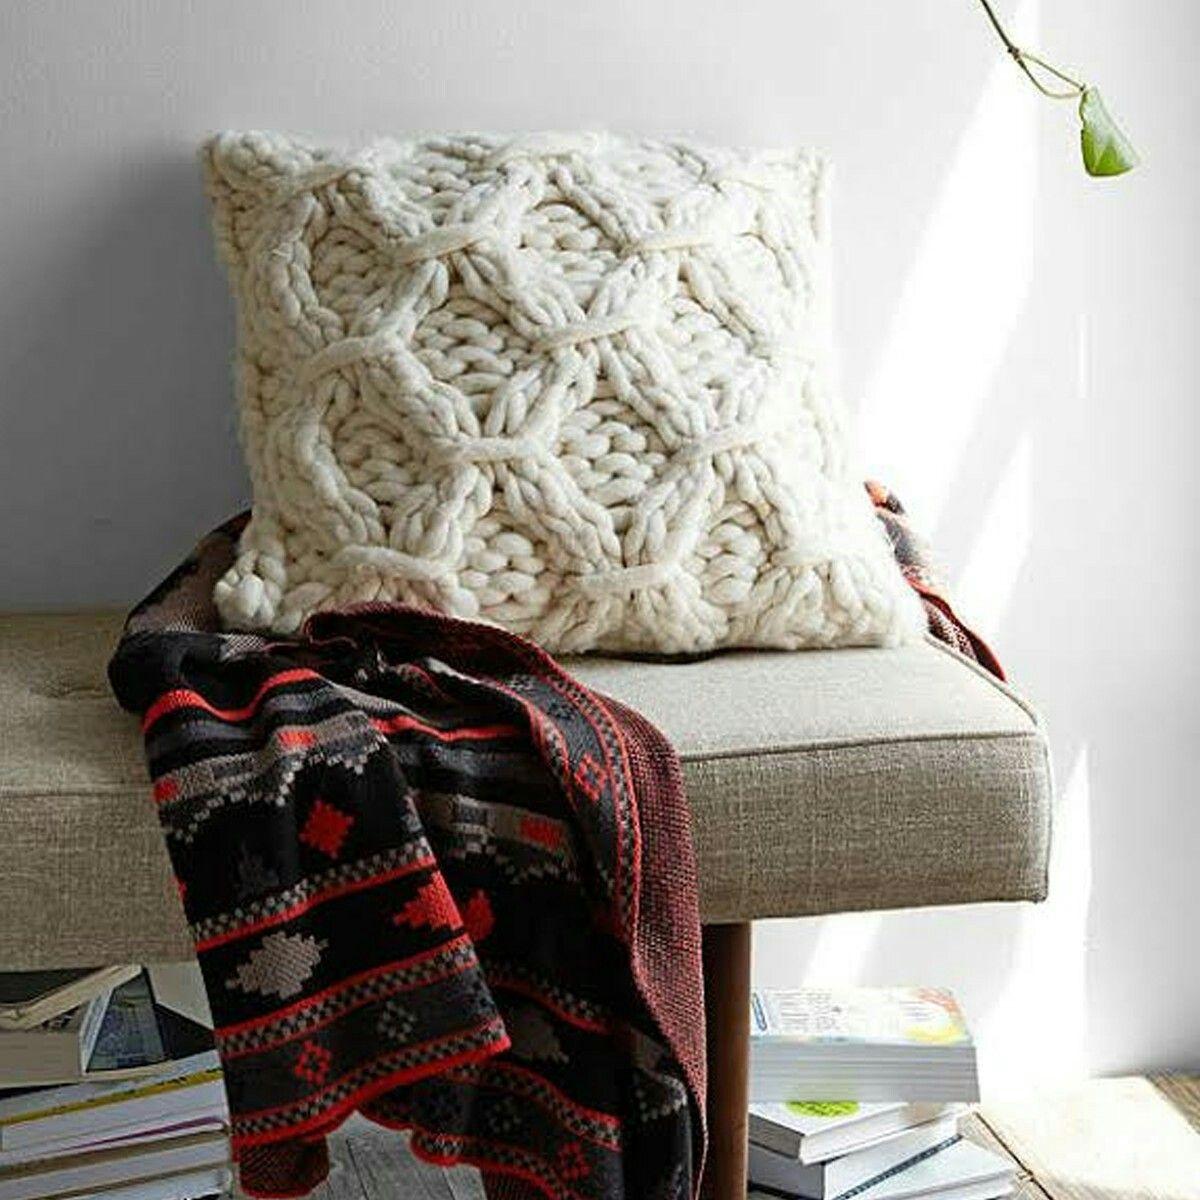 Pin by Maria Perez on SEWING FUN Pillows, Knit pillow